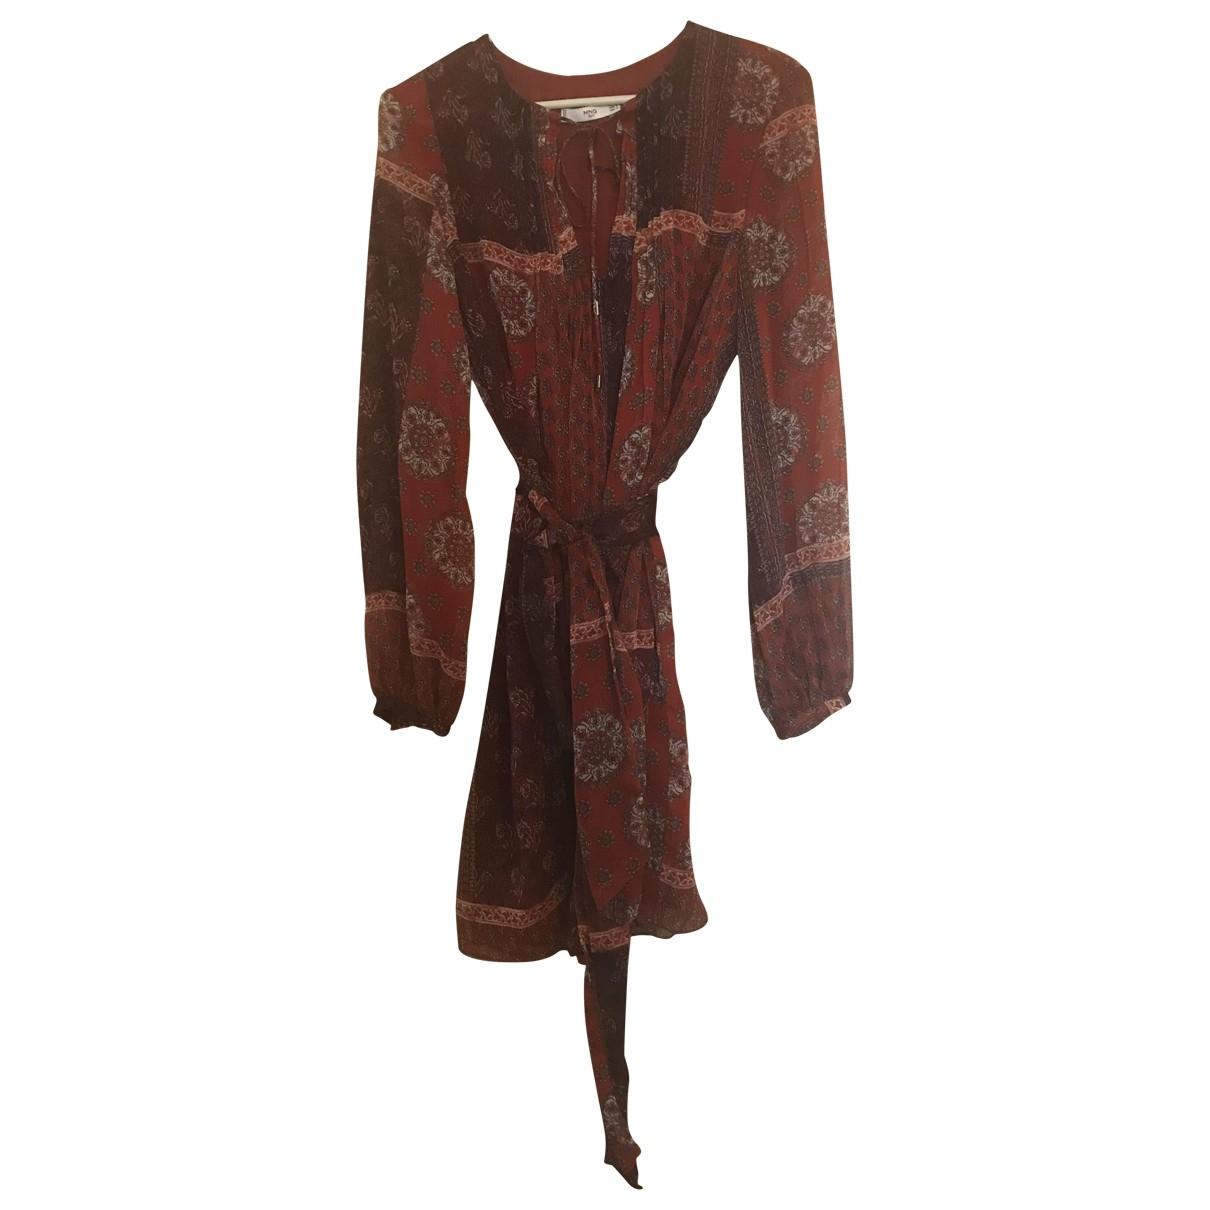 Mango \N Burgundy dress for Women M International